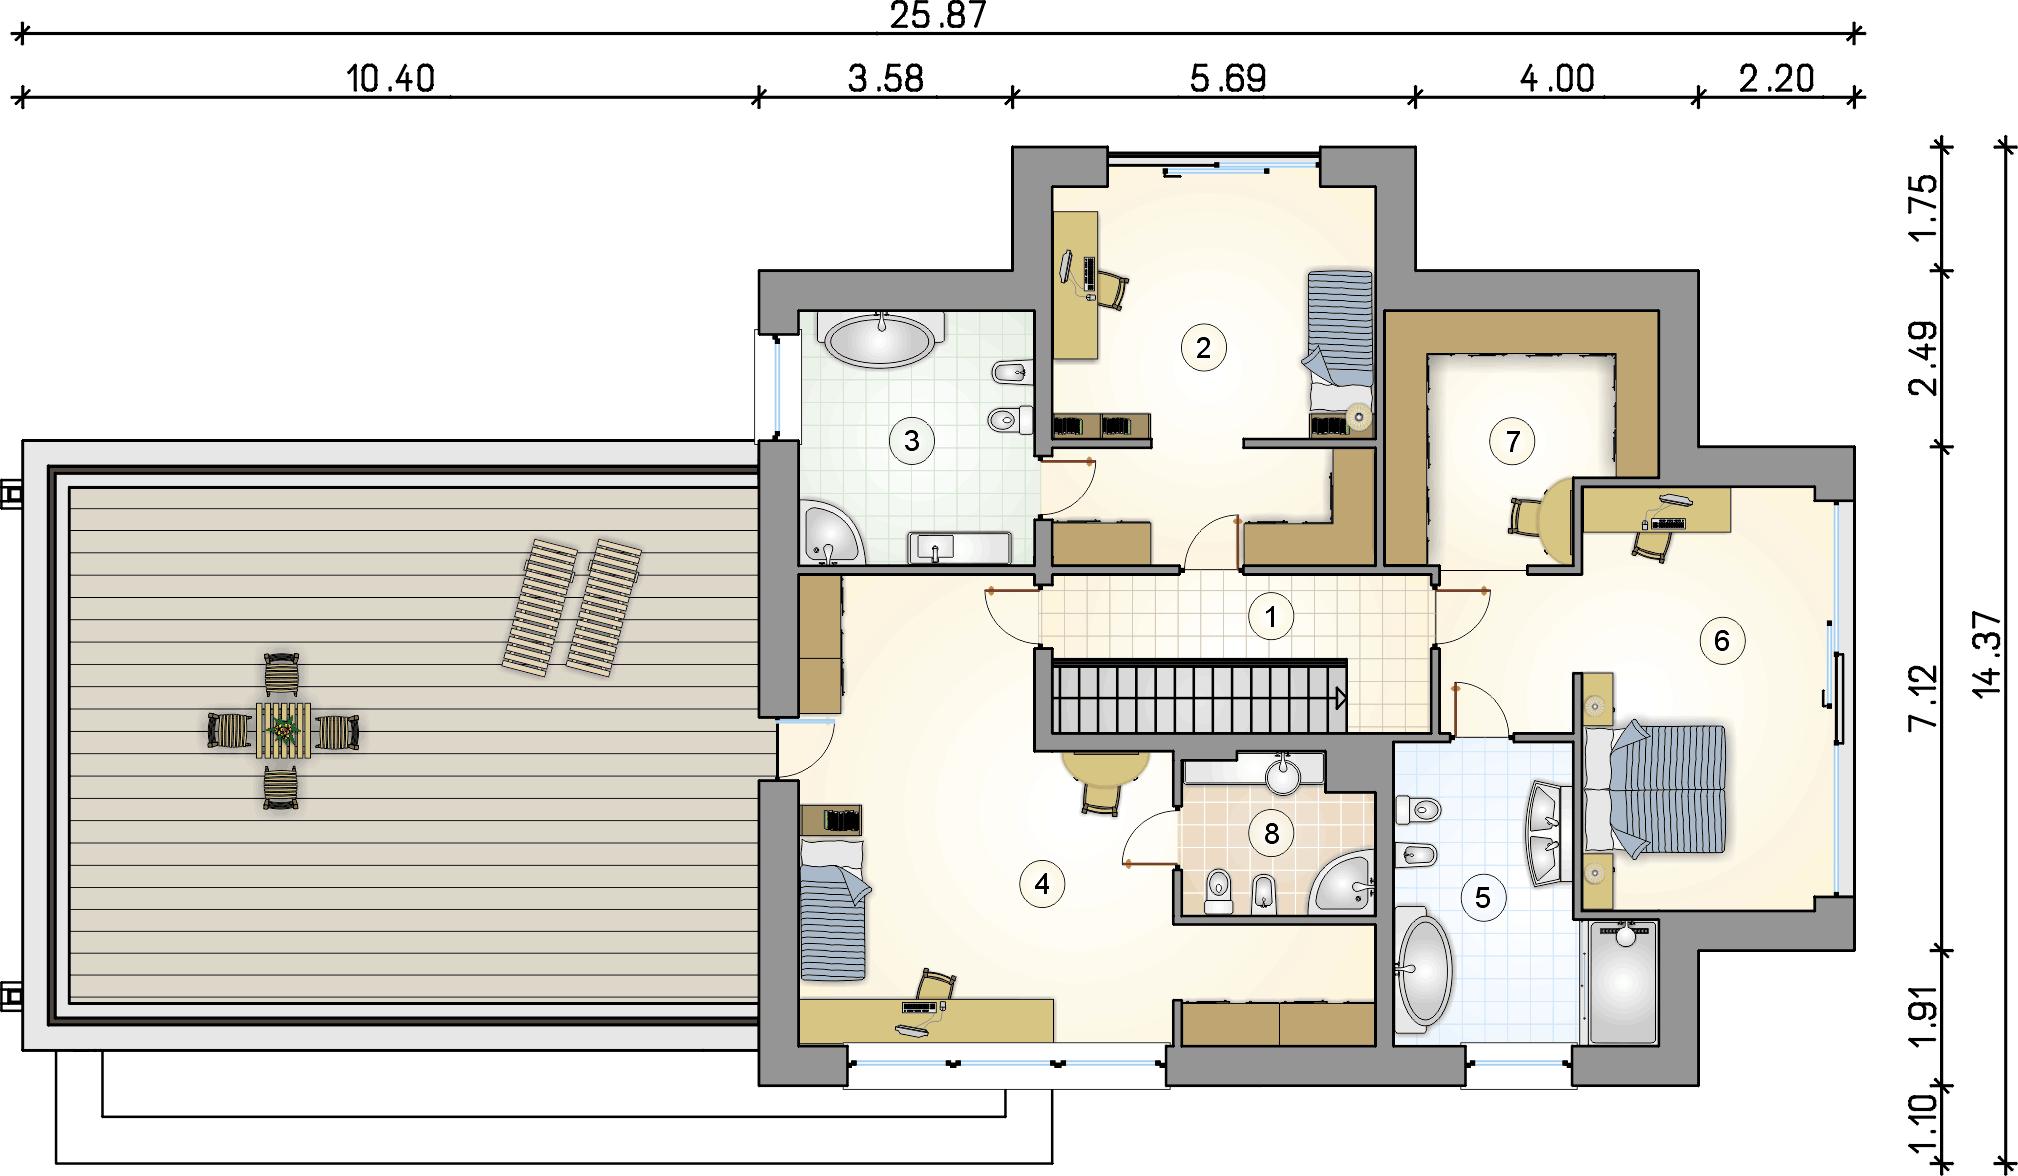 Rzut piętra - projekt Senator IV - wersja lustrzana